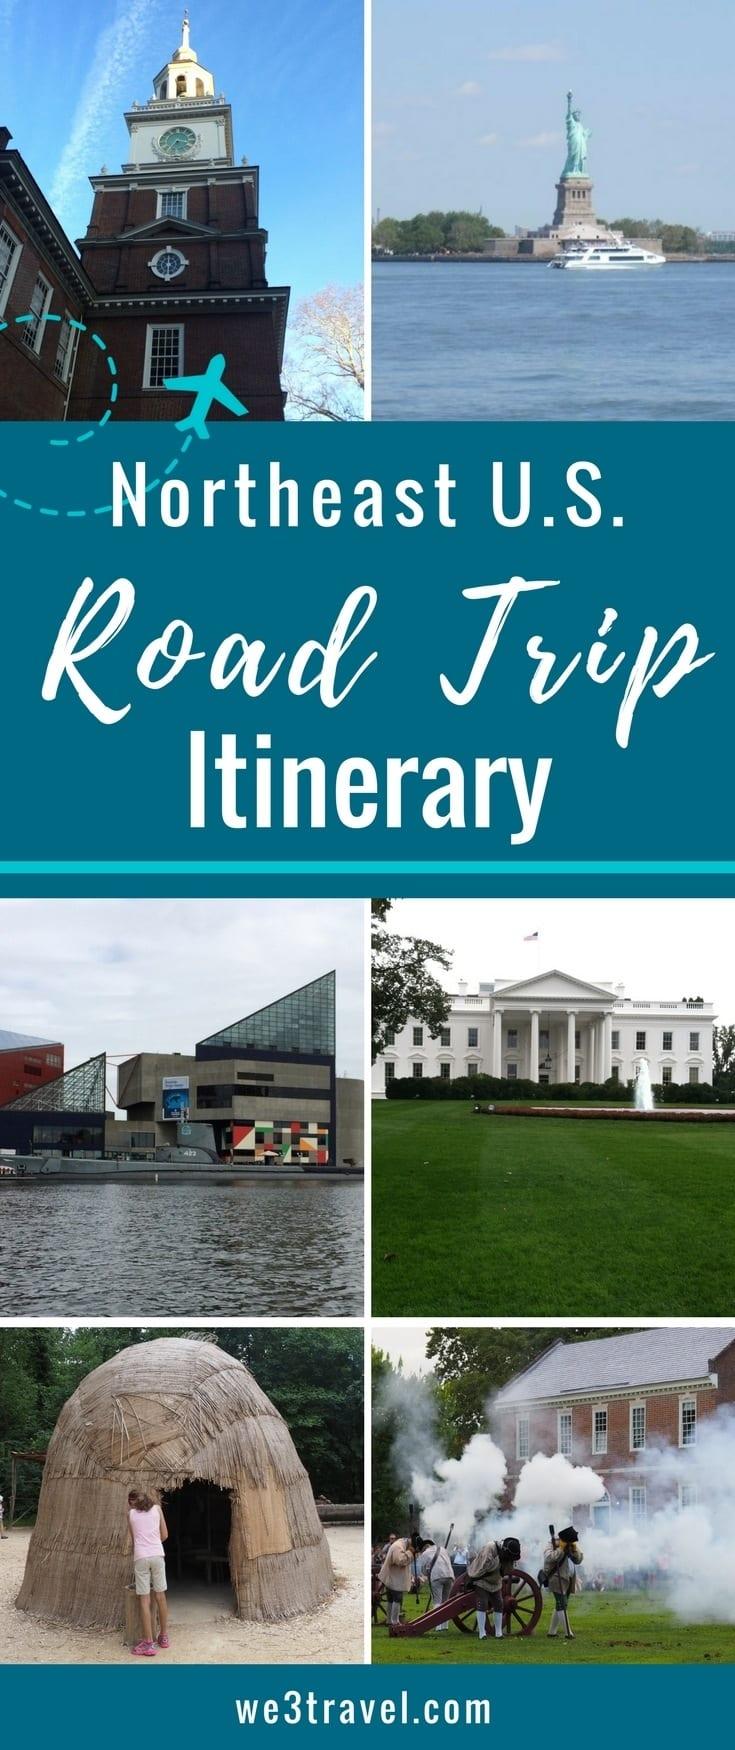 Northeast road trip itinerary for visiting Williamsburg, Jamestown, Washington DC, Baltimore, Philadelphia, New York and Boston #roadtrip #northeast #boston #familytravel